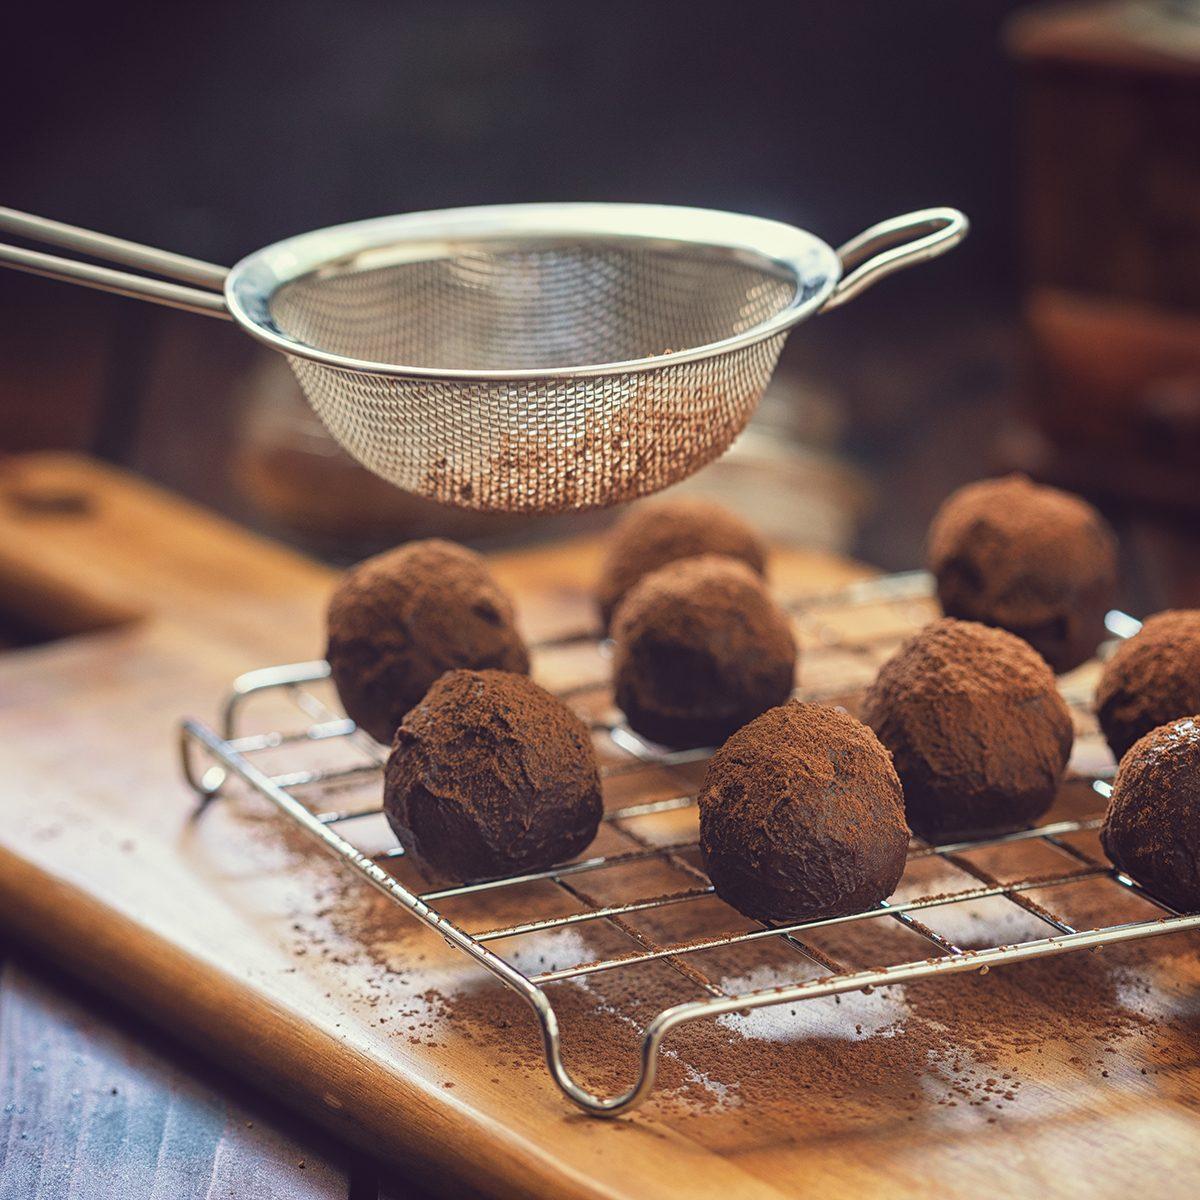 Young Woman Preparing Chocolate Truffles